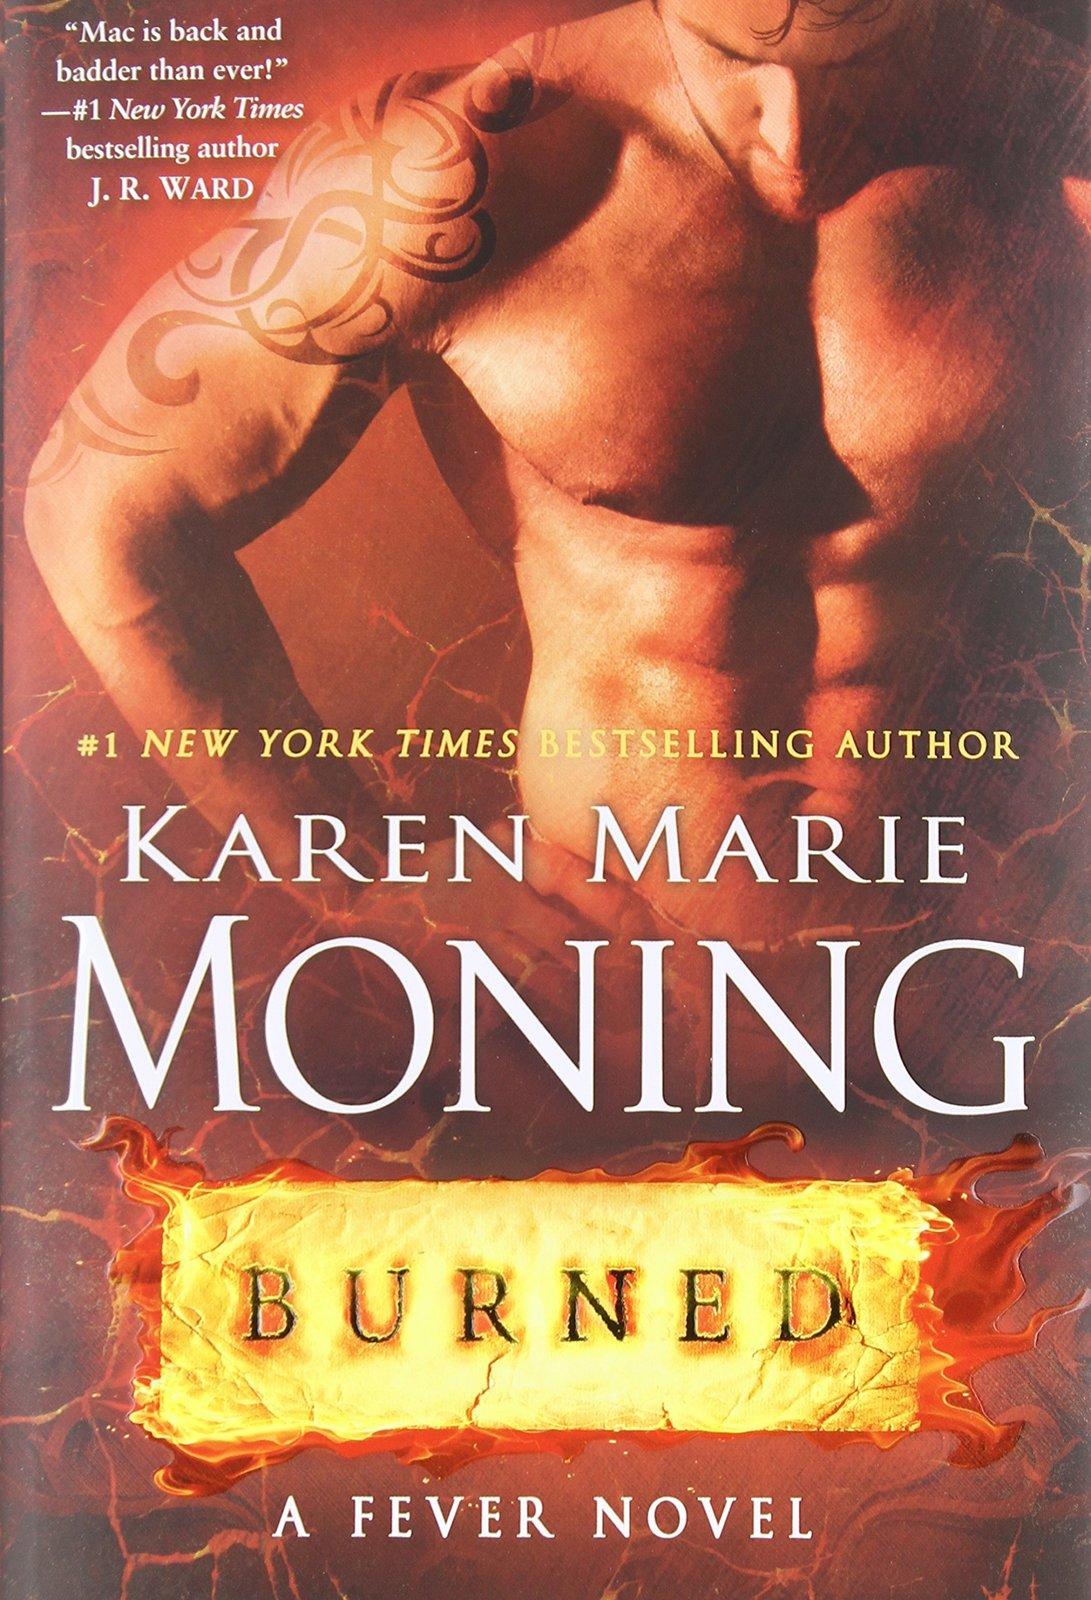 Burned by Karen Marie Moning image